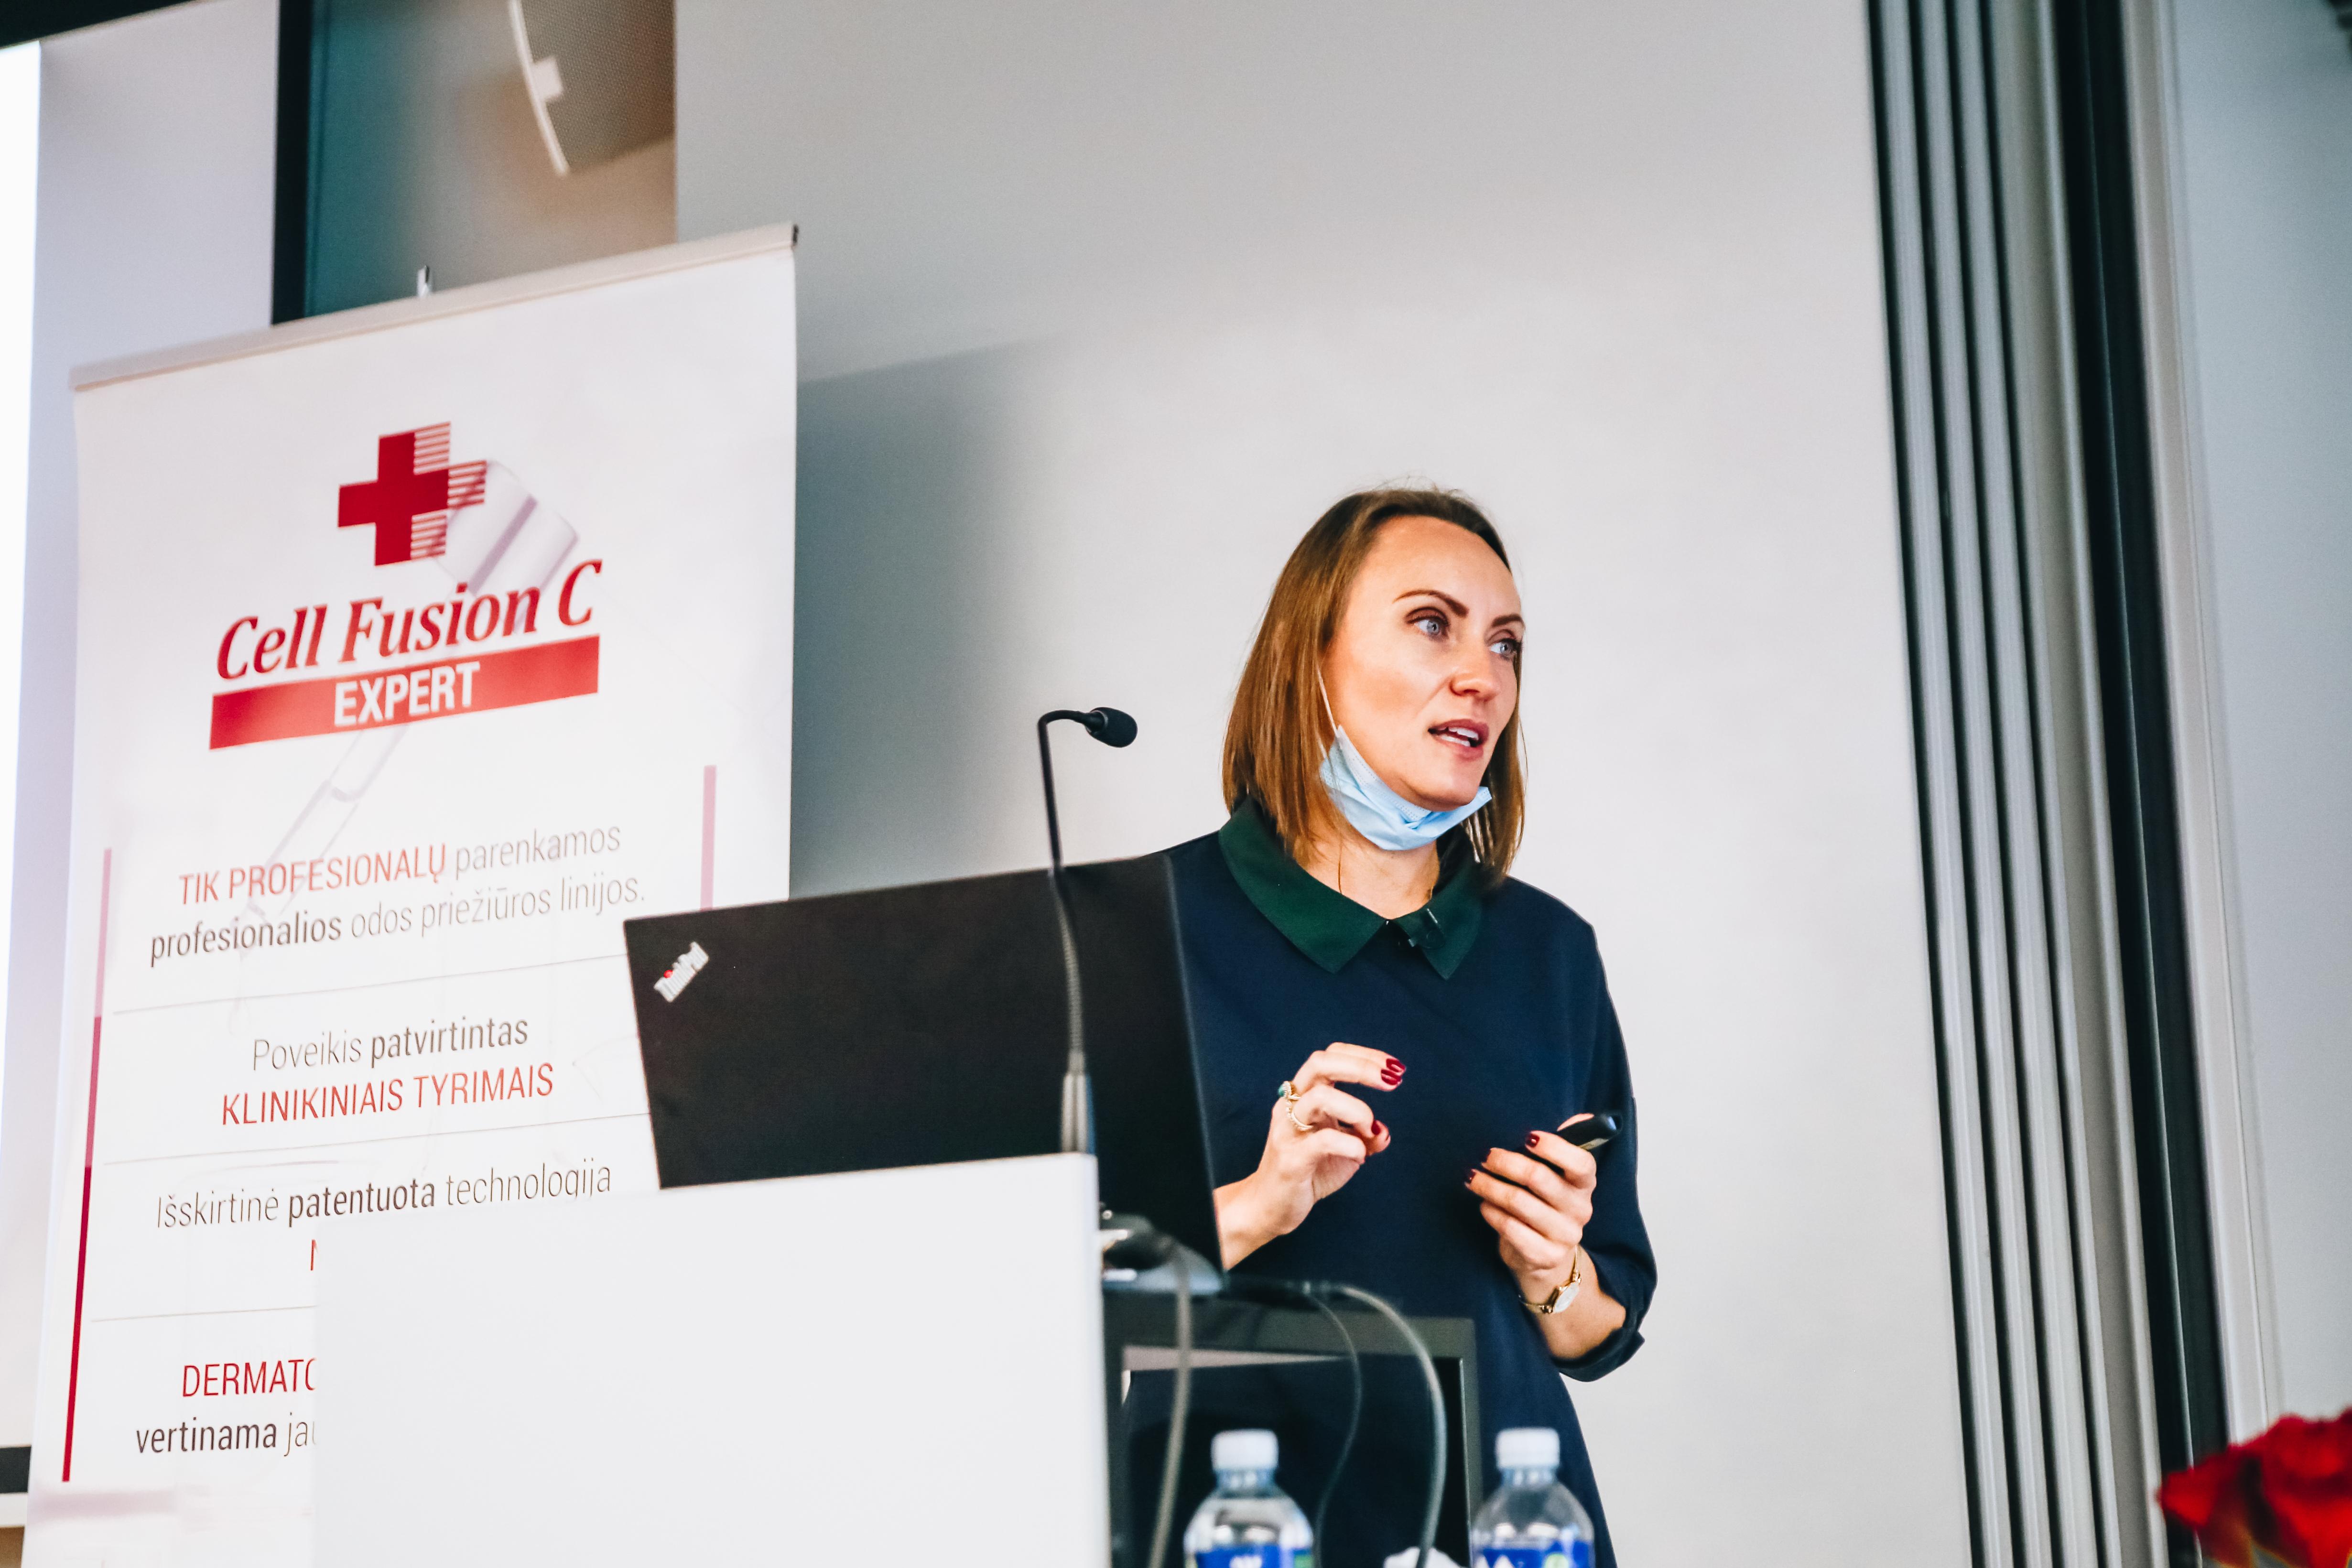 Cell Fusion C Expert mokslinė konferencija su doc. dr. Diana Barragan Ferrer